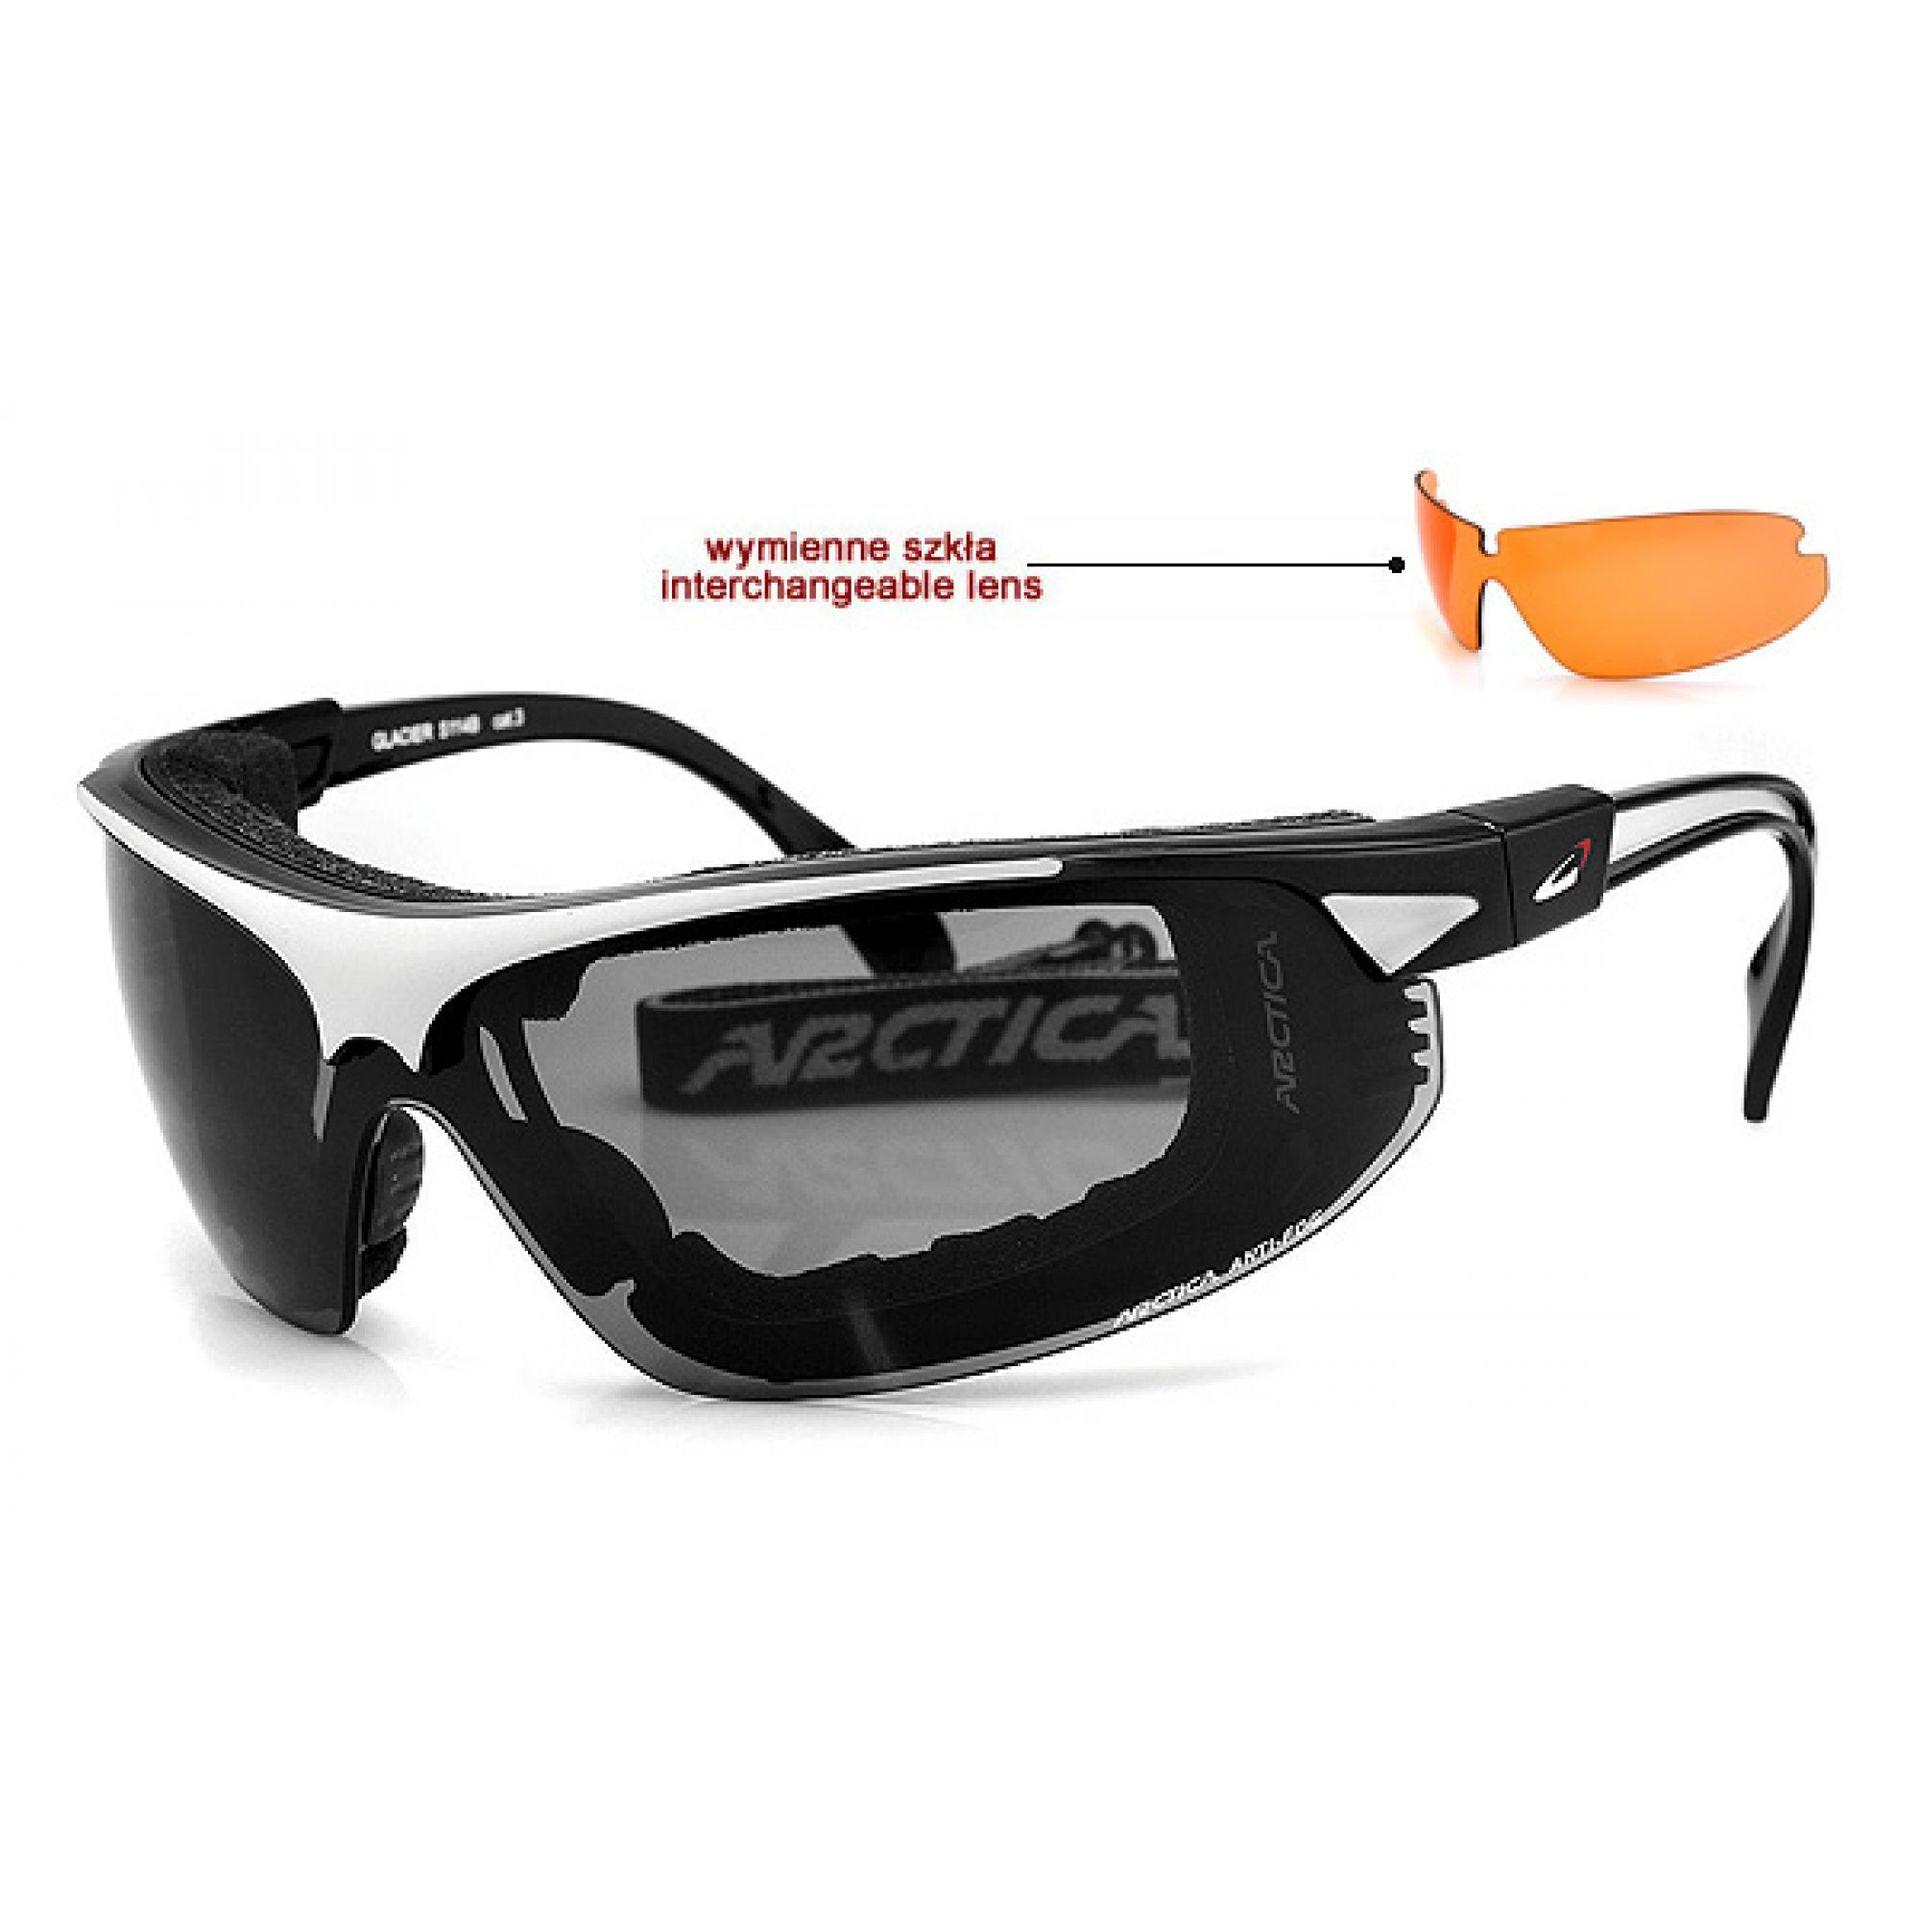 Okulary Arctica S-114E biało czarne